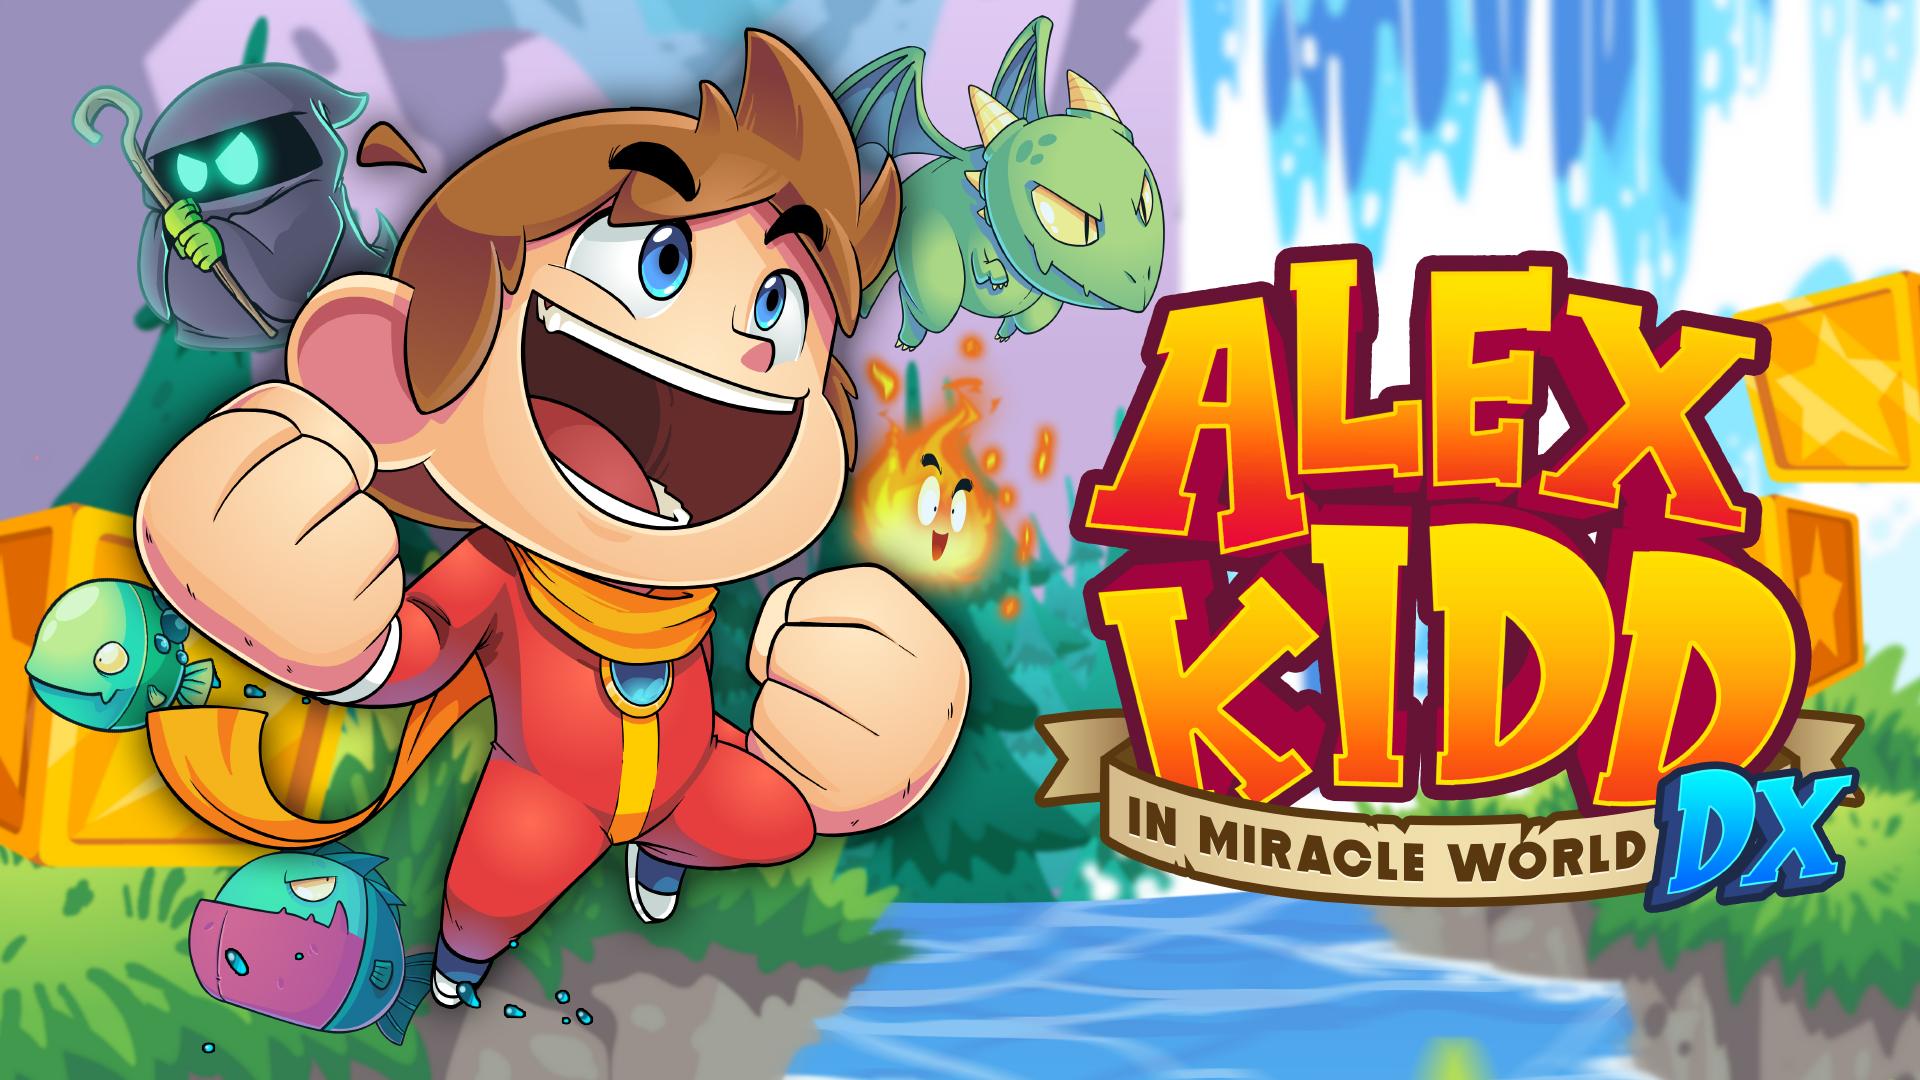 AlexKiddinMiracleWorldDX_KeyArt1920x1080